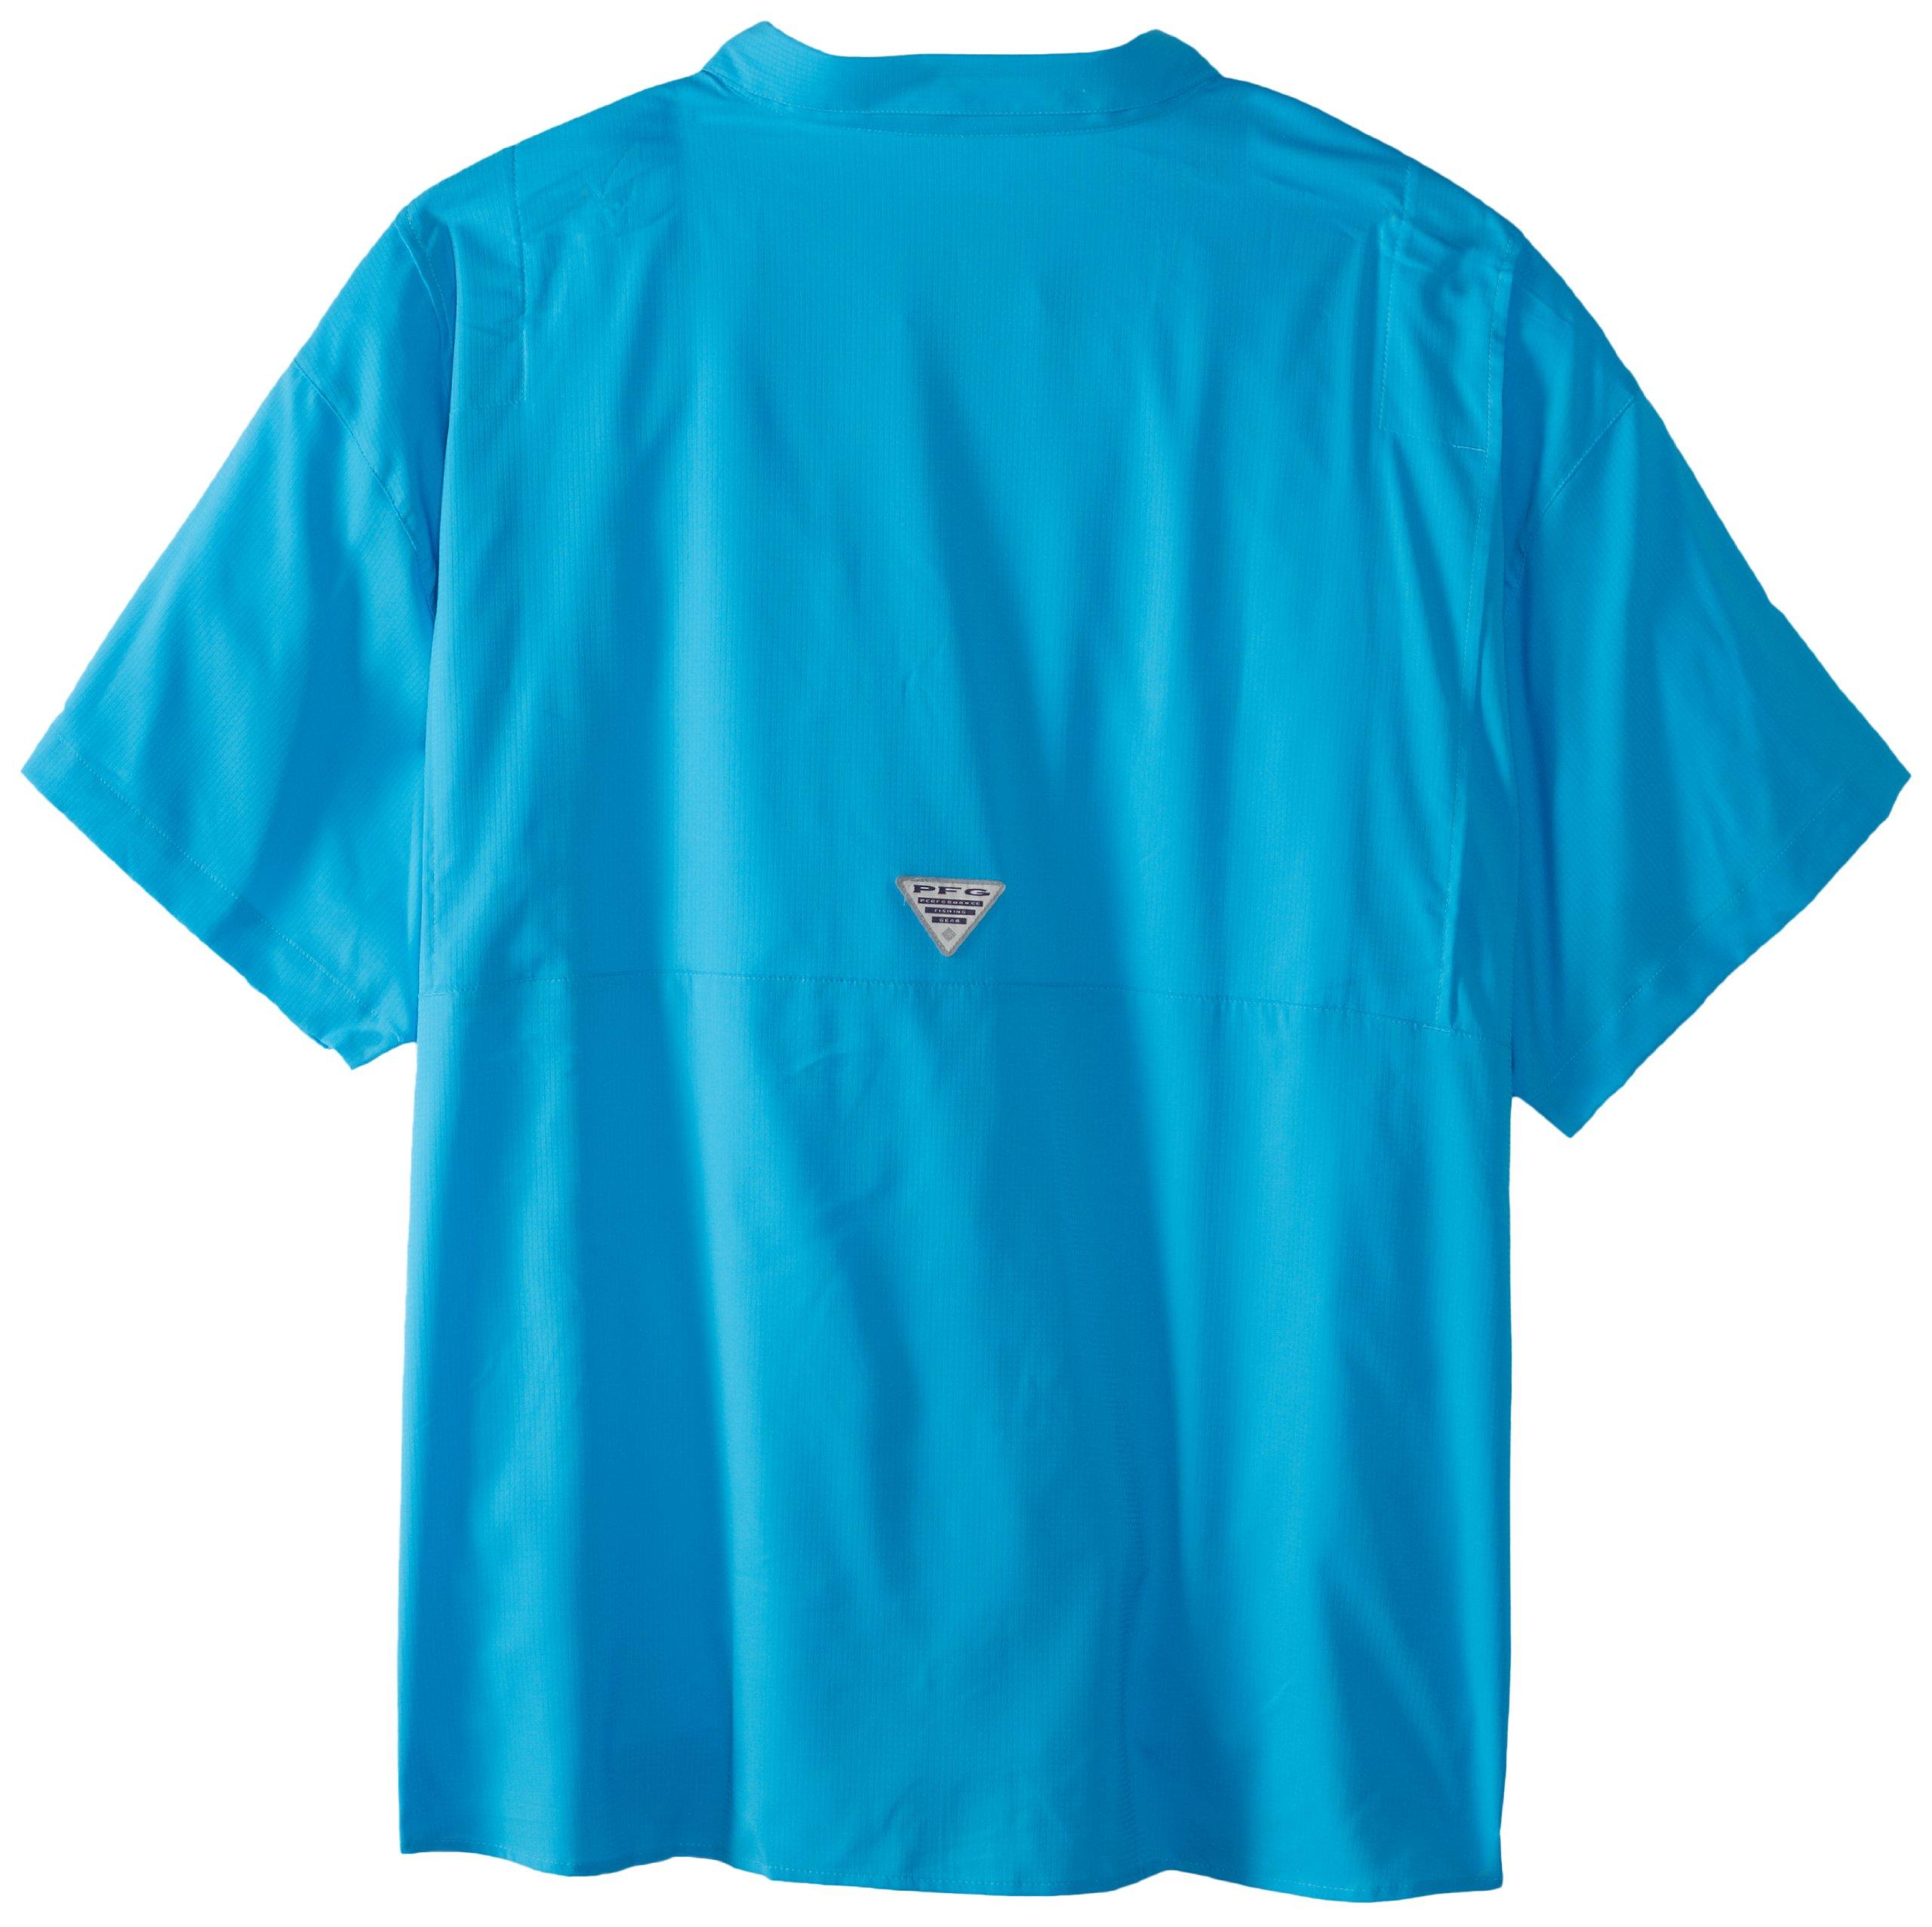 Columbia Men's Tamiami II Short Sleeve Fishing Shirt, Riptide, 4X by Columbia (Image #2)